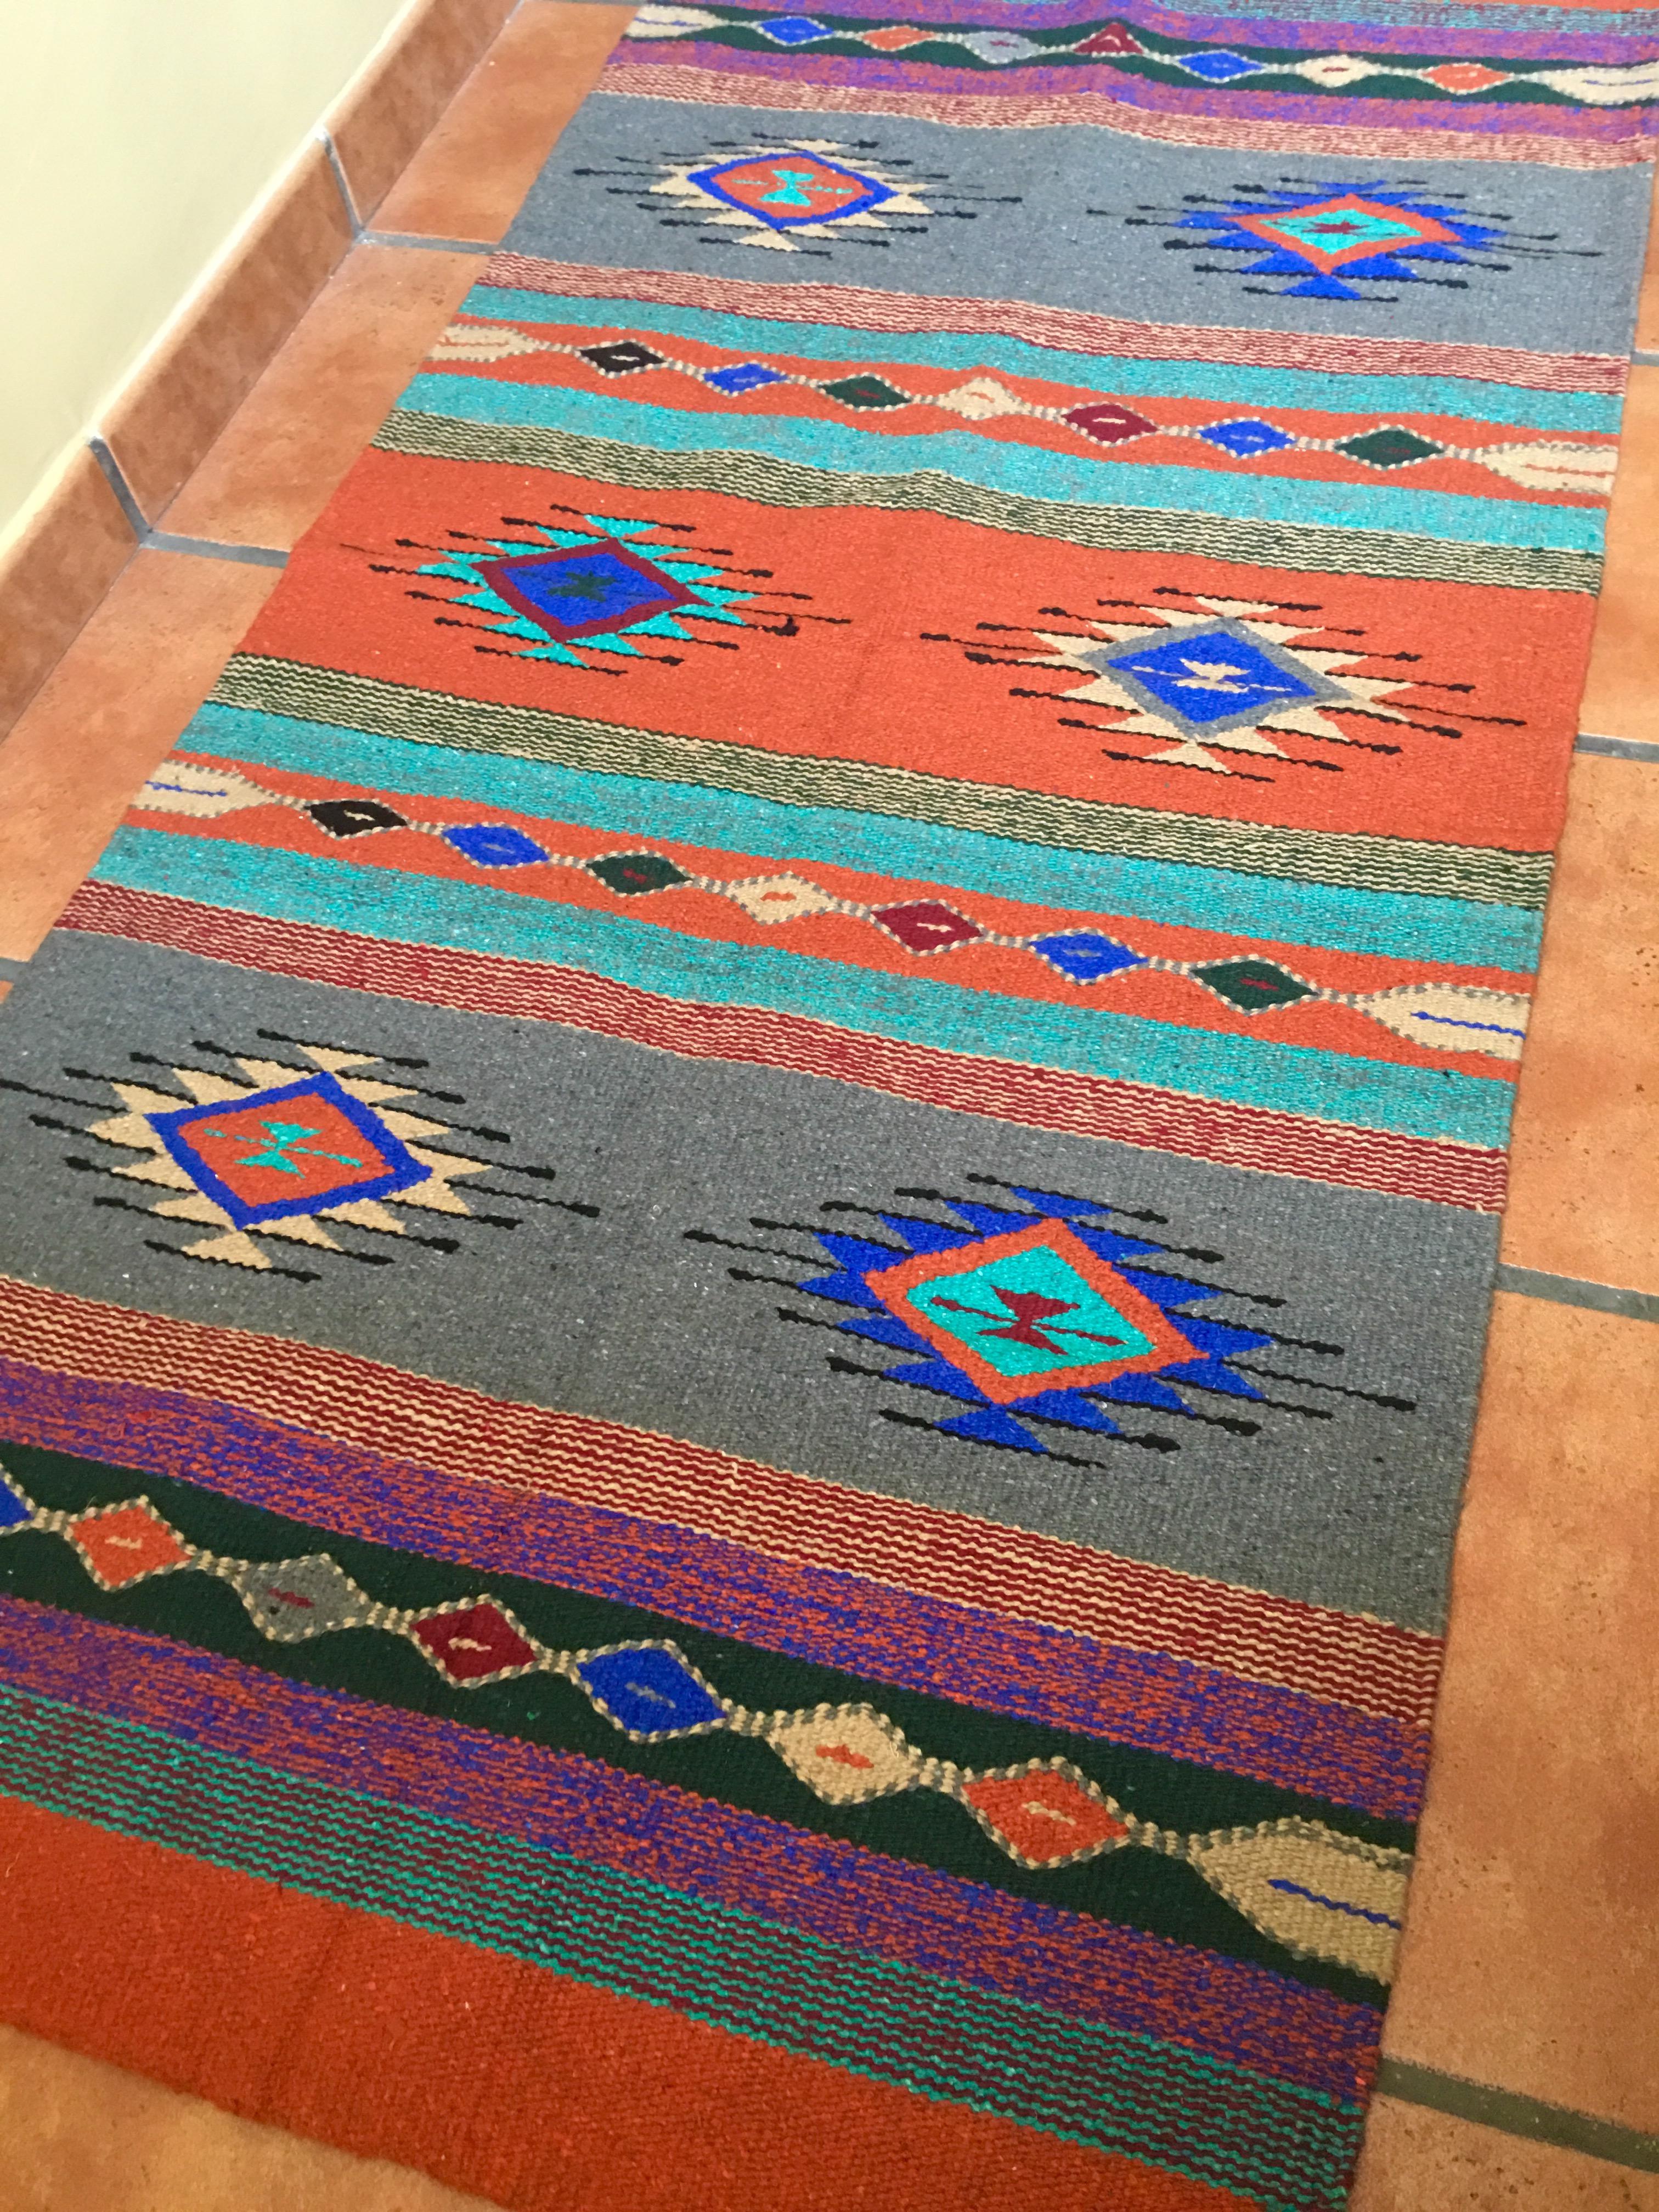 Alfombra Naranja y Gris Tejida a Mano Bronzebrook, alfombra nativoamericana, alfombra india, alfombra tribal, alfombra dibujo western, alfombra country, alfombra estilo suroeste americano, alfombra estilo bohemio, alfombra estilo bohochic, decoración bohochic, decoración country, alfombra rústica